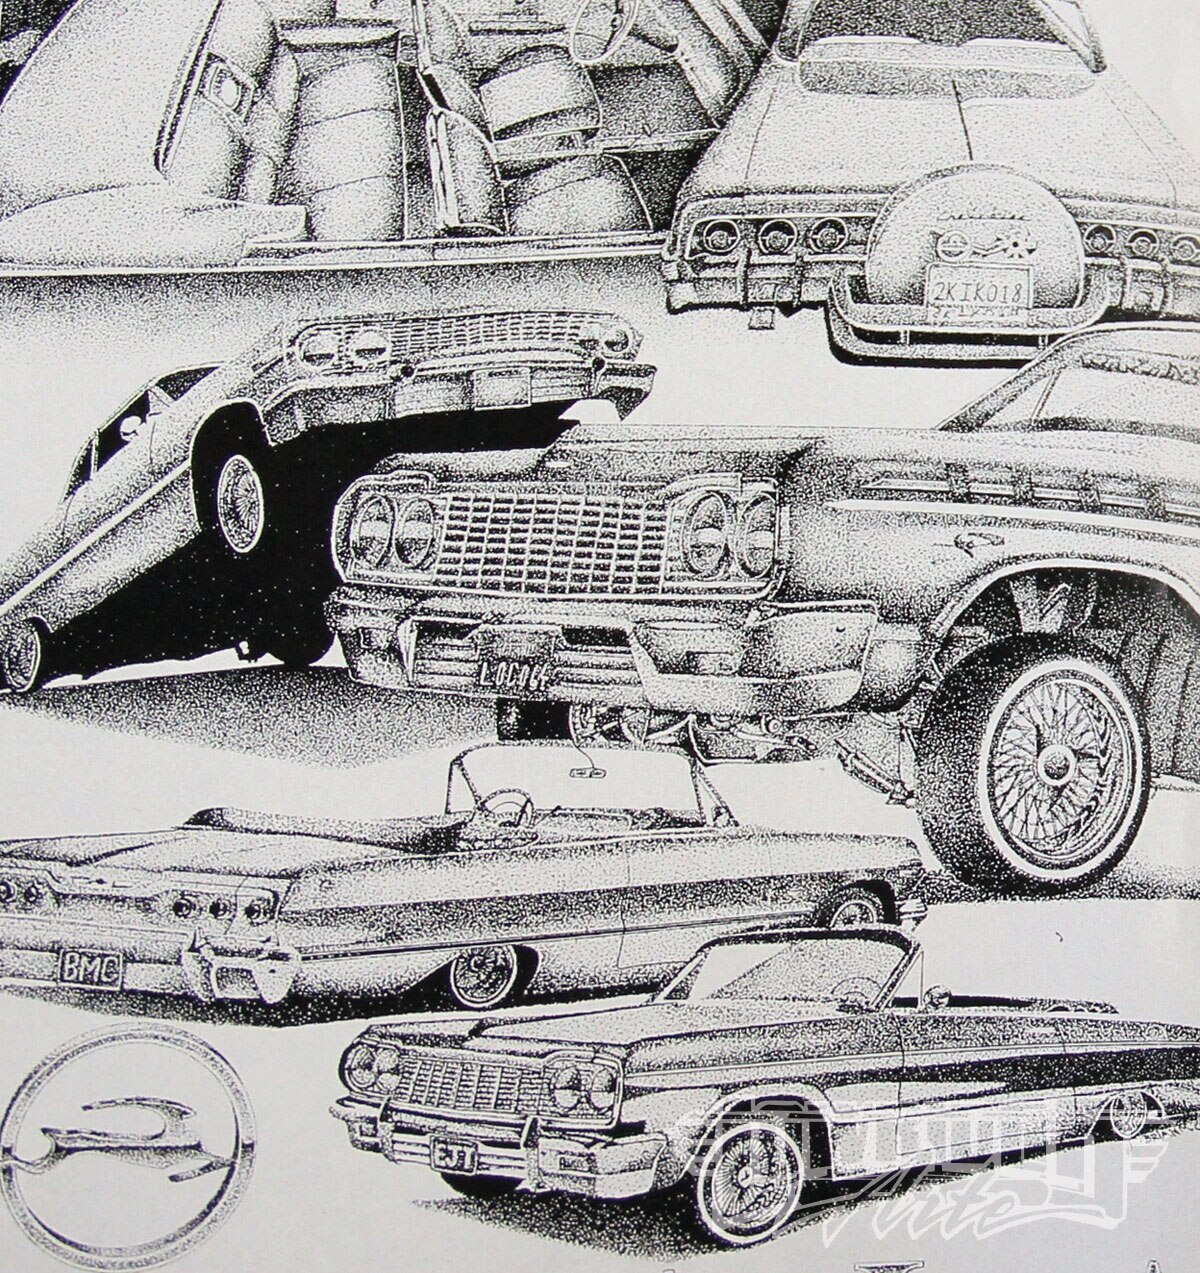 Brian Harris Chevrolet >> Looking Back At 20 Years Of Lowrider Arte - Lowrider Arte Magazine